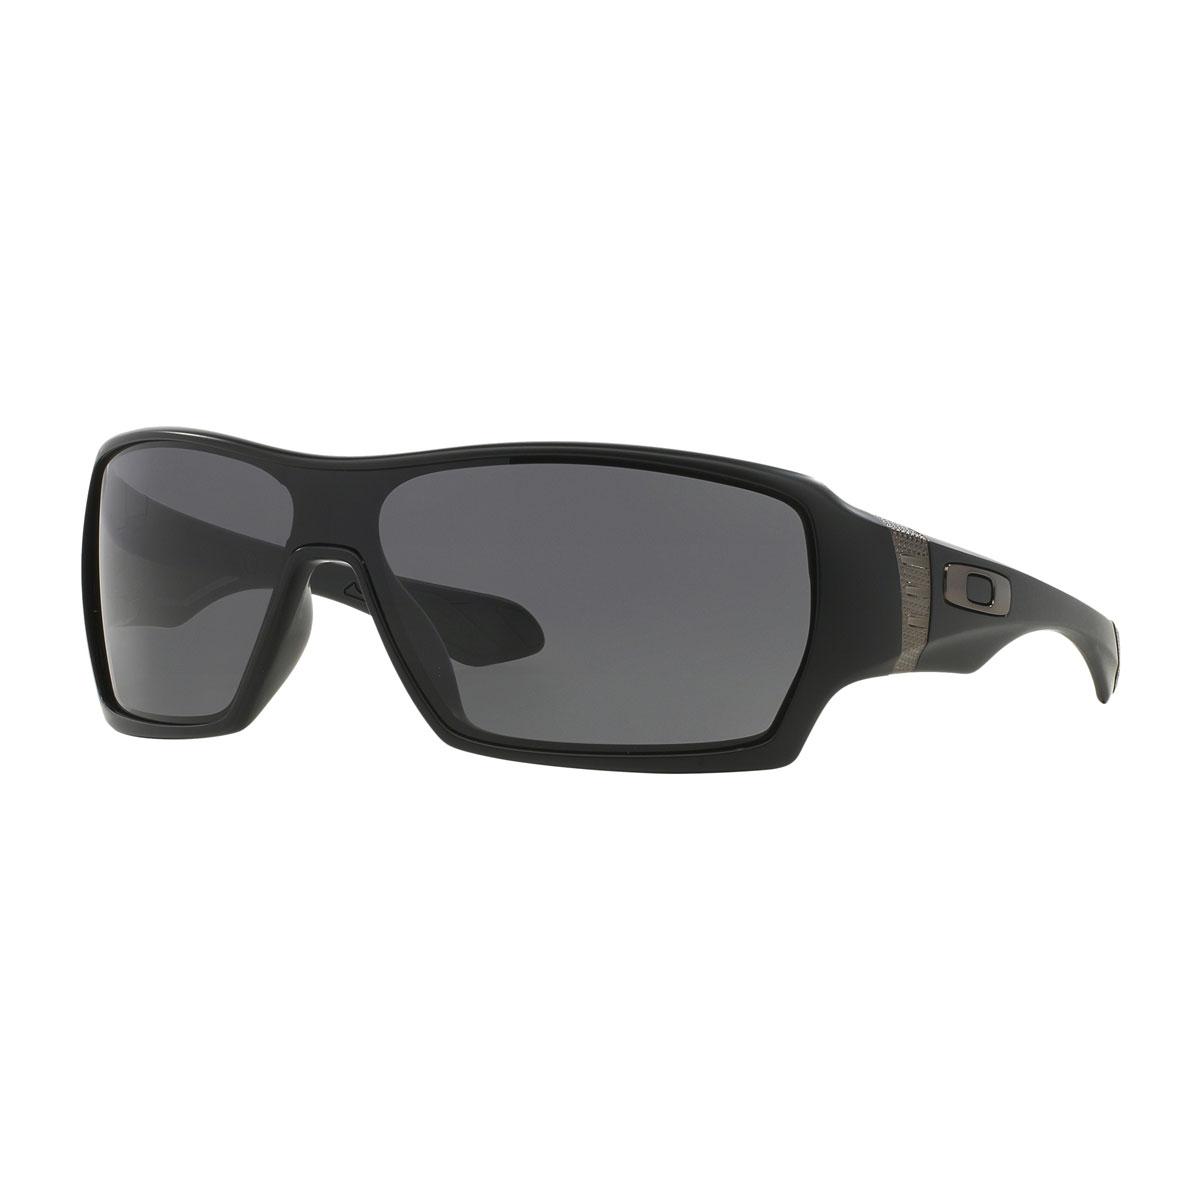 Black Sunglasses Polarized Crystal Frameblack Iridium Oakley Lens Offshoot 35Rj4qAL